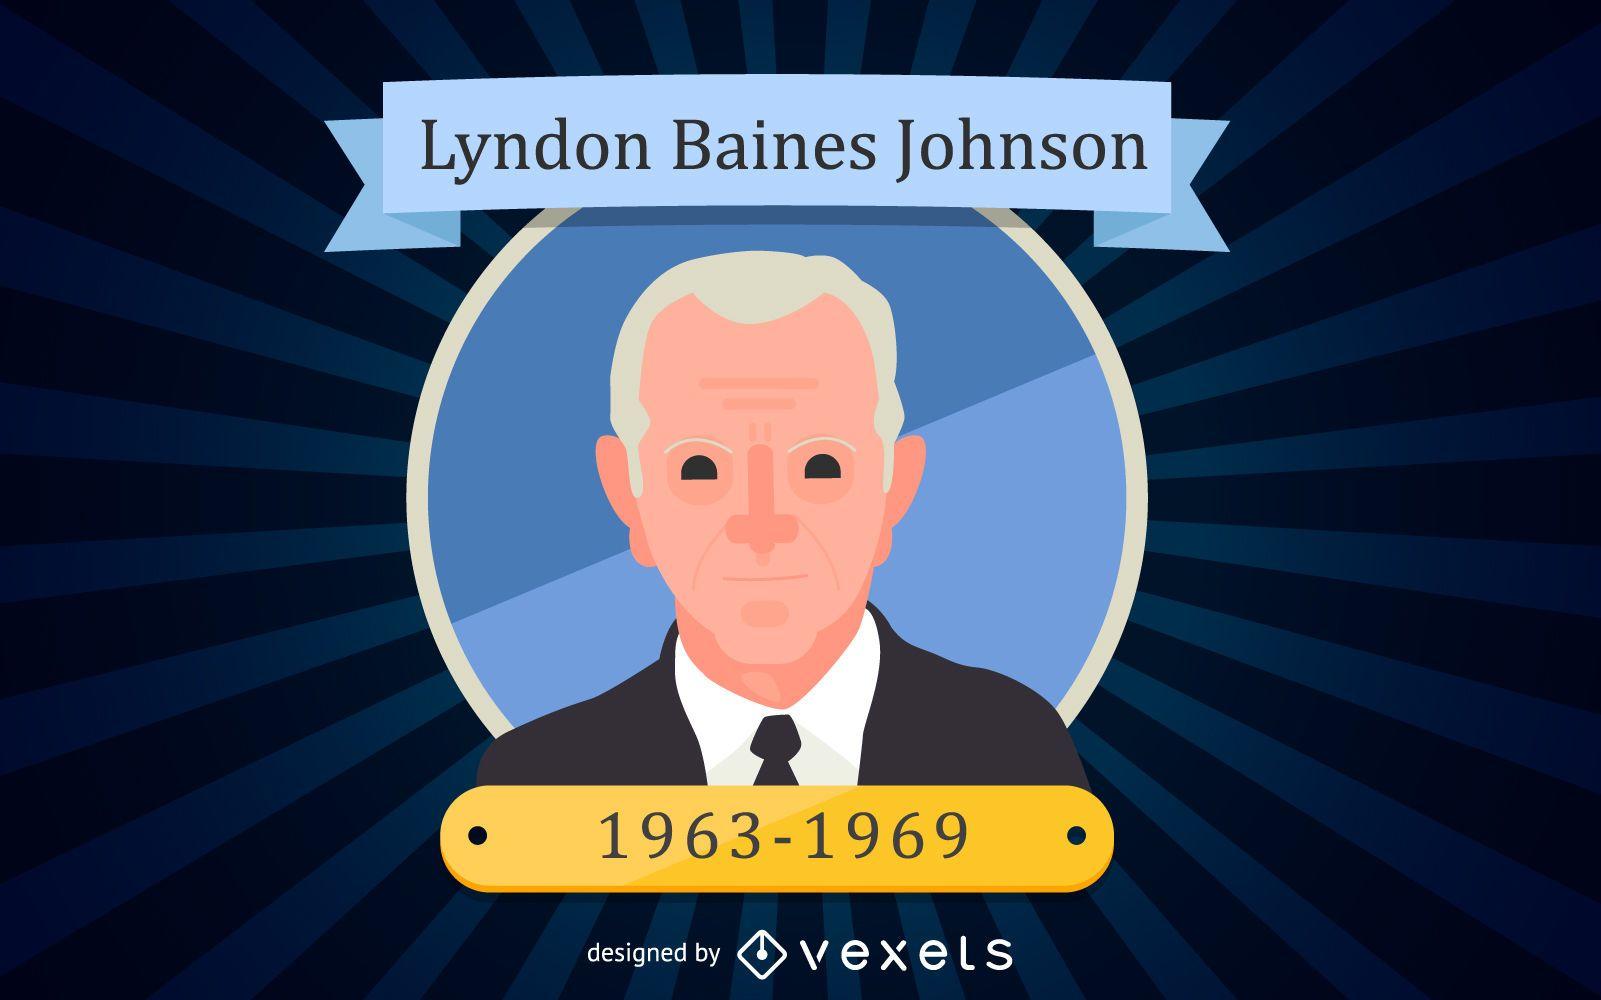 Retrato de dibujos animados de Lyndon Baines Johnson